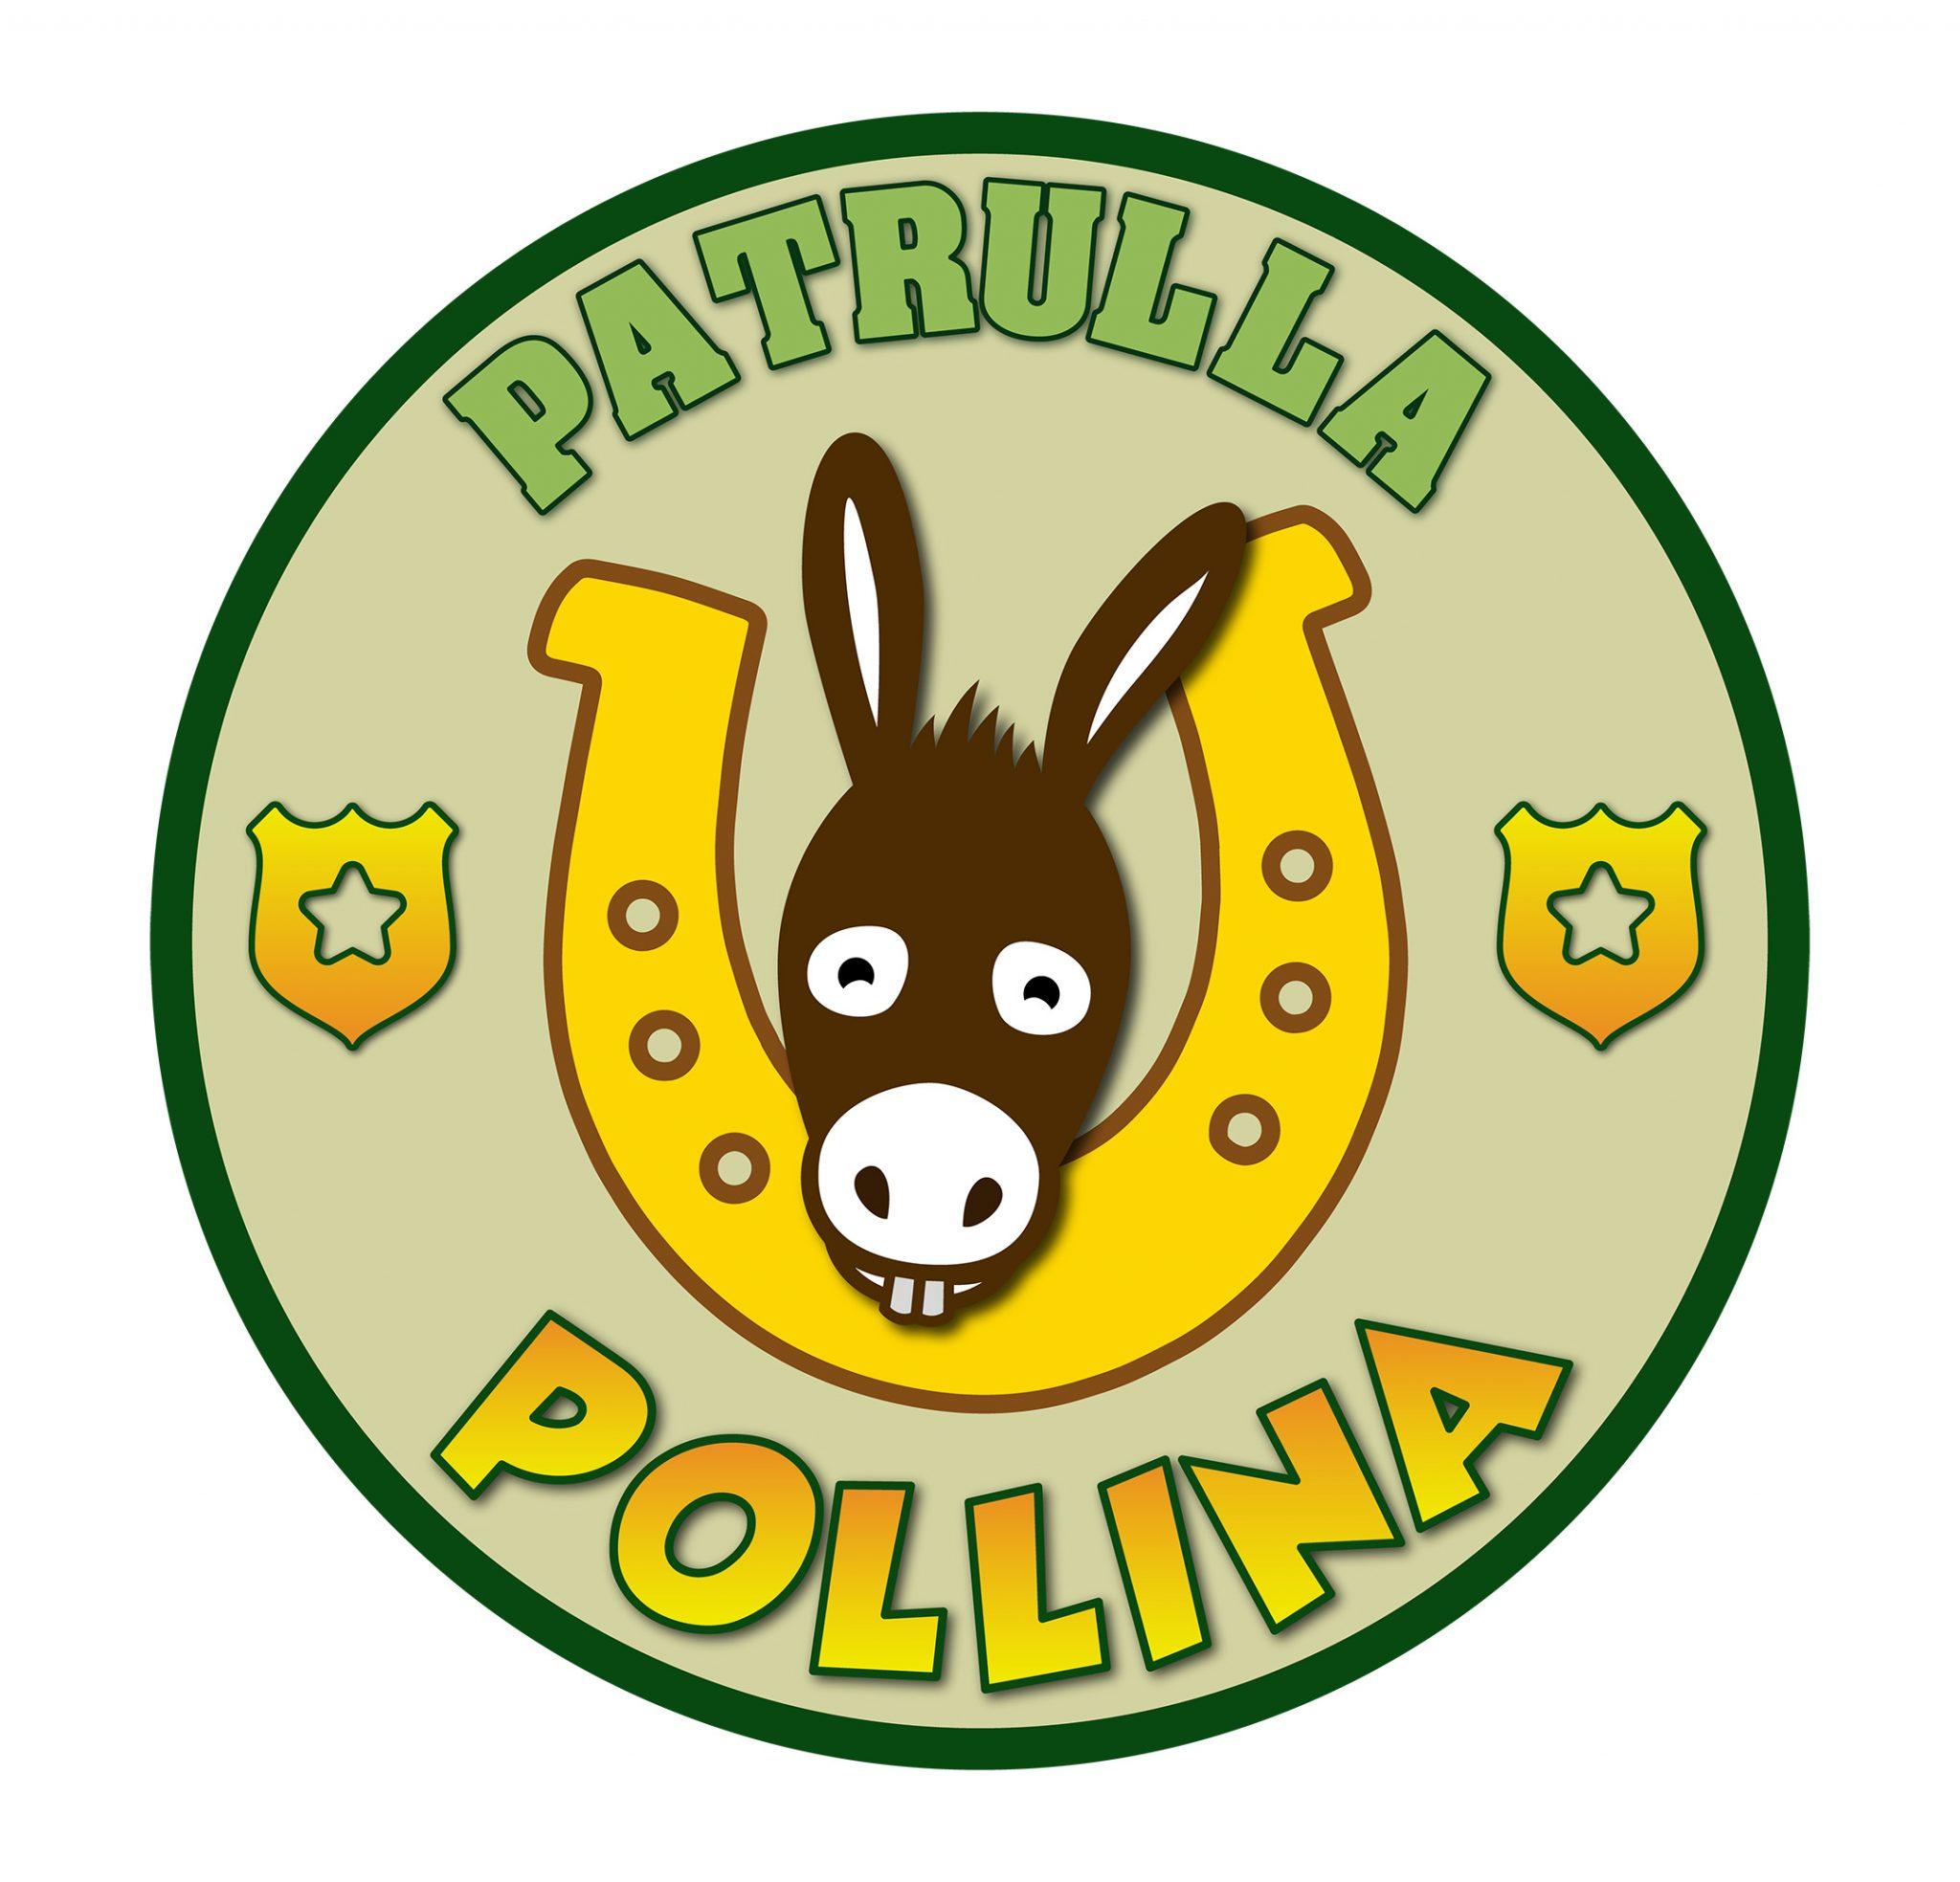 patrulla_pollina-copia